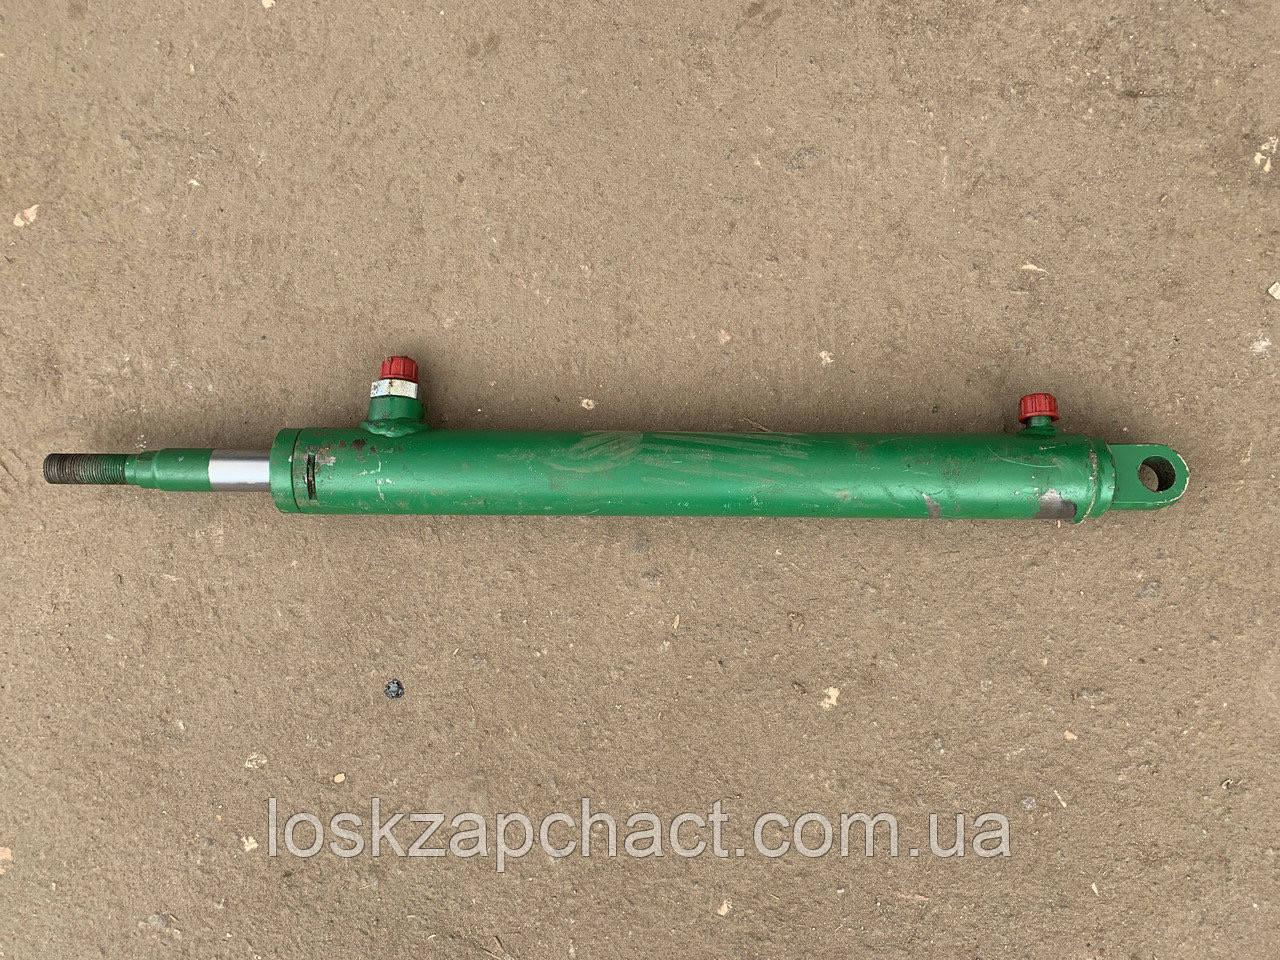 Гидроцилиндр ДОН подъема мотовила (d штока 25мм)